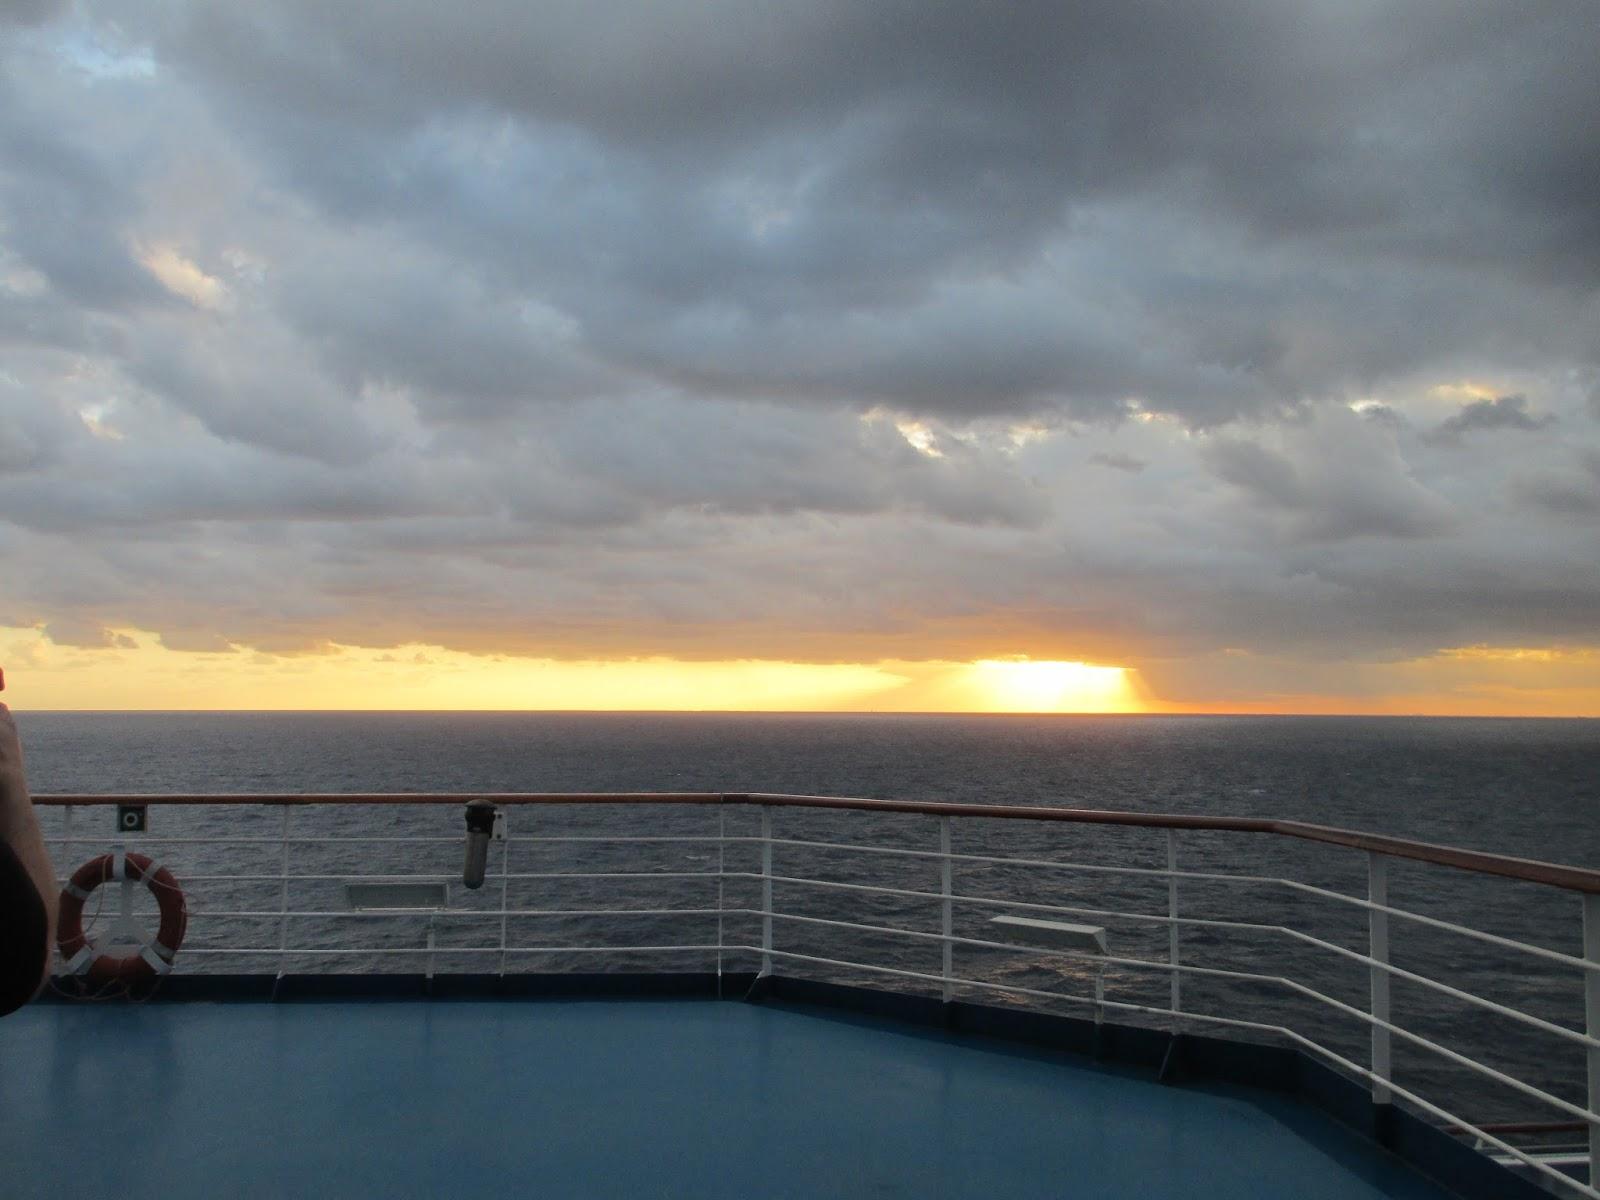 carnival splendor balcony room reviews Travel Reviews Information Carnival Splendor Cruise 7